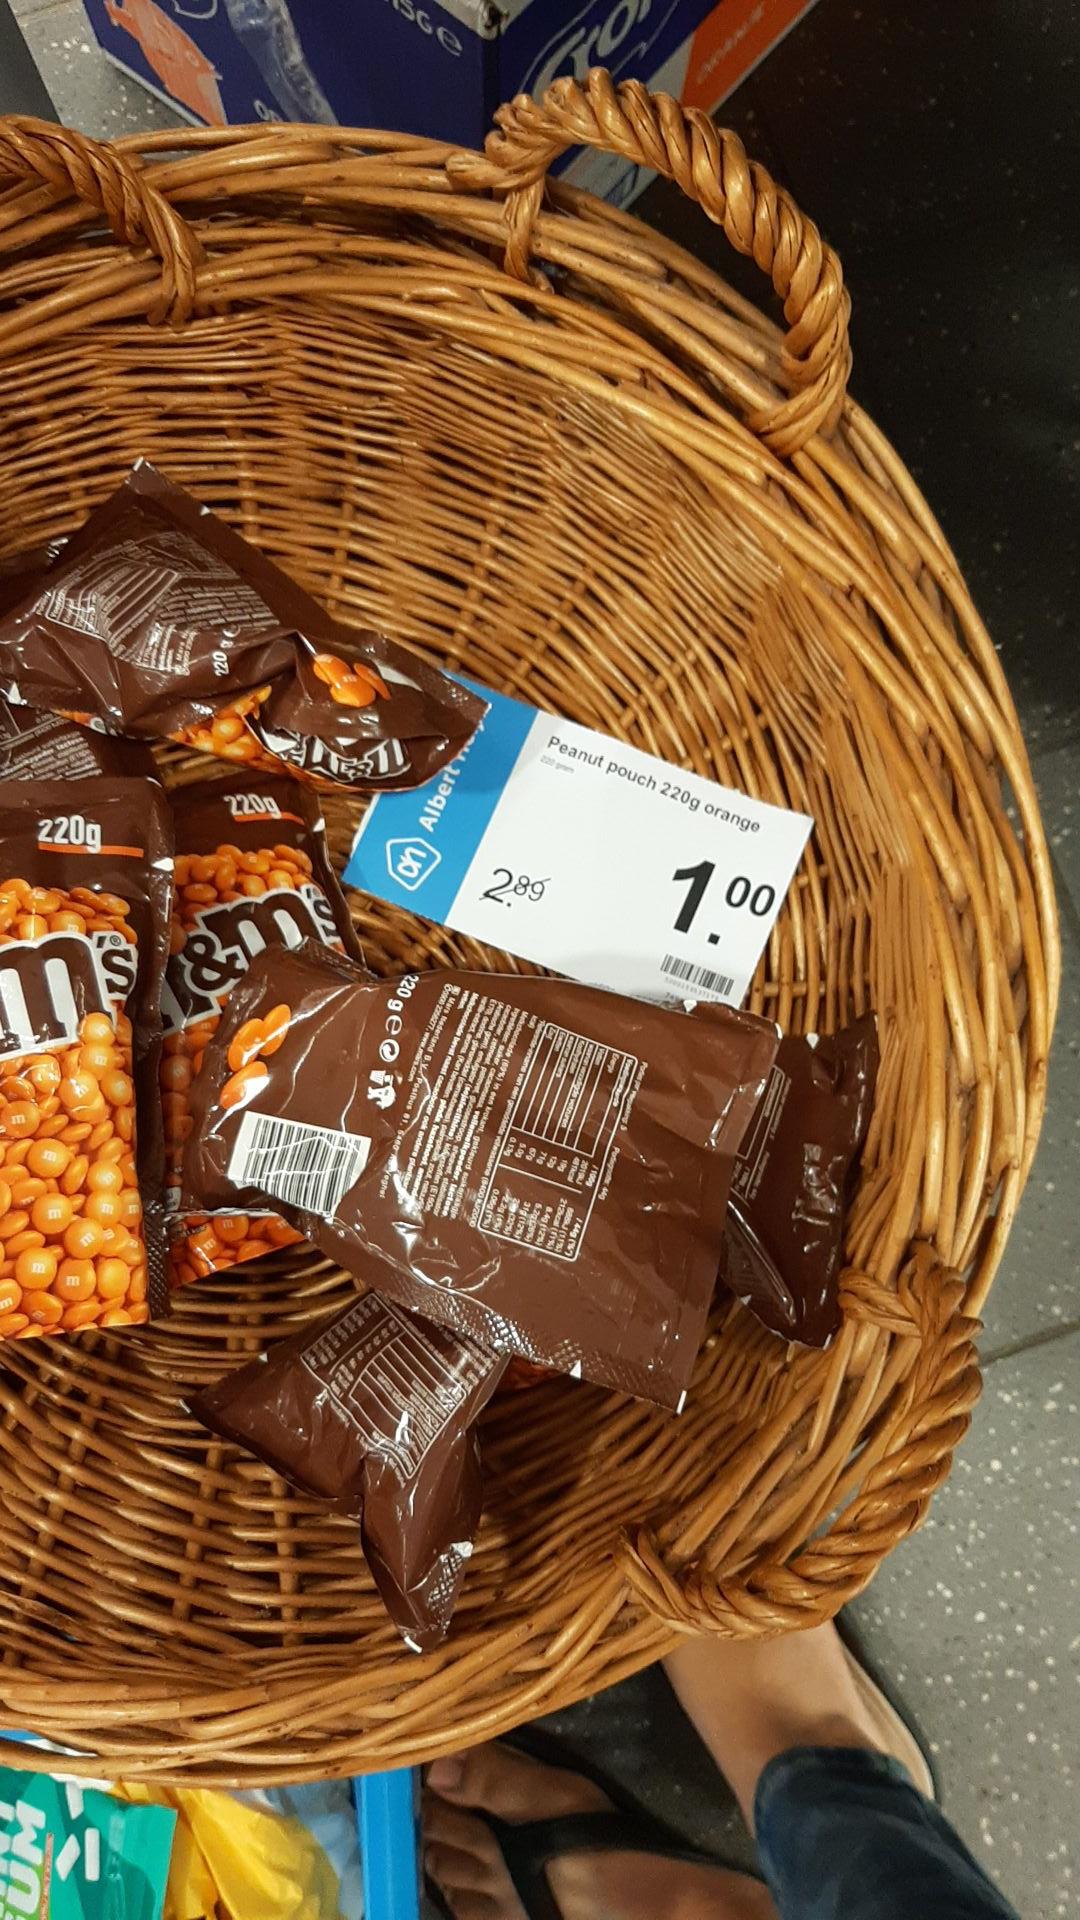 [Lokaal] M&M'S Peanut pouch 220g Orange €1 @Albert Heijn Hoogerheide